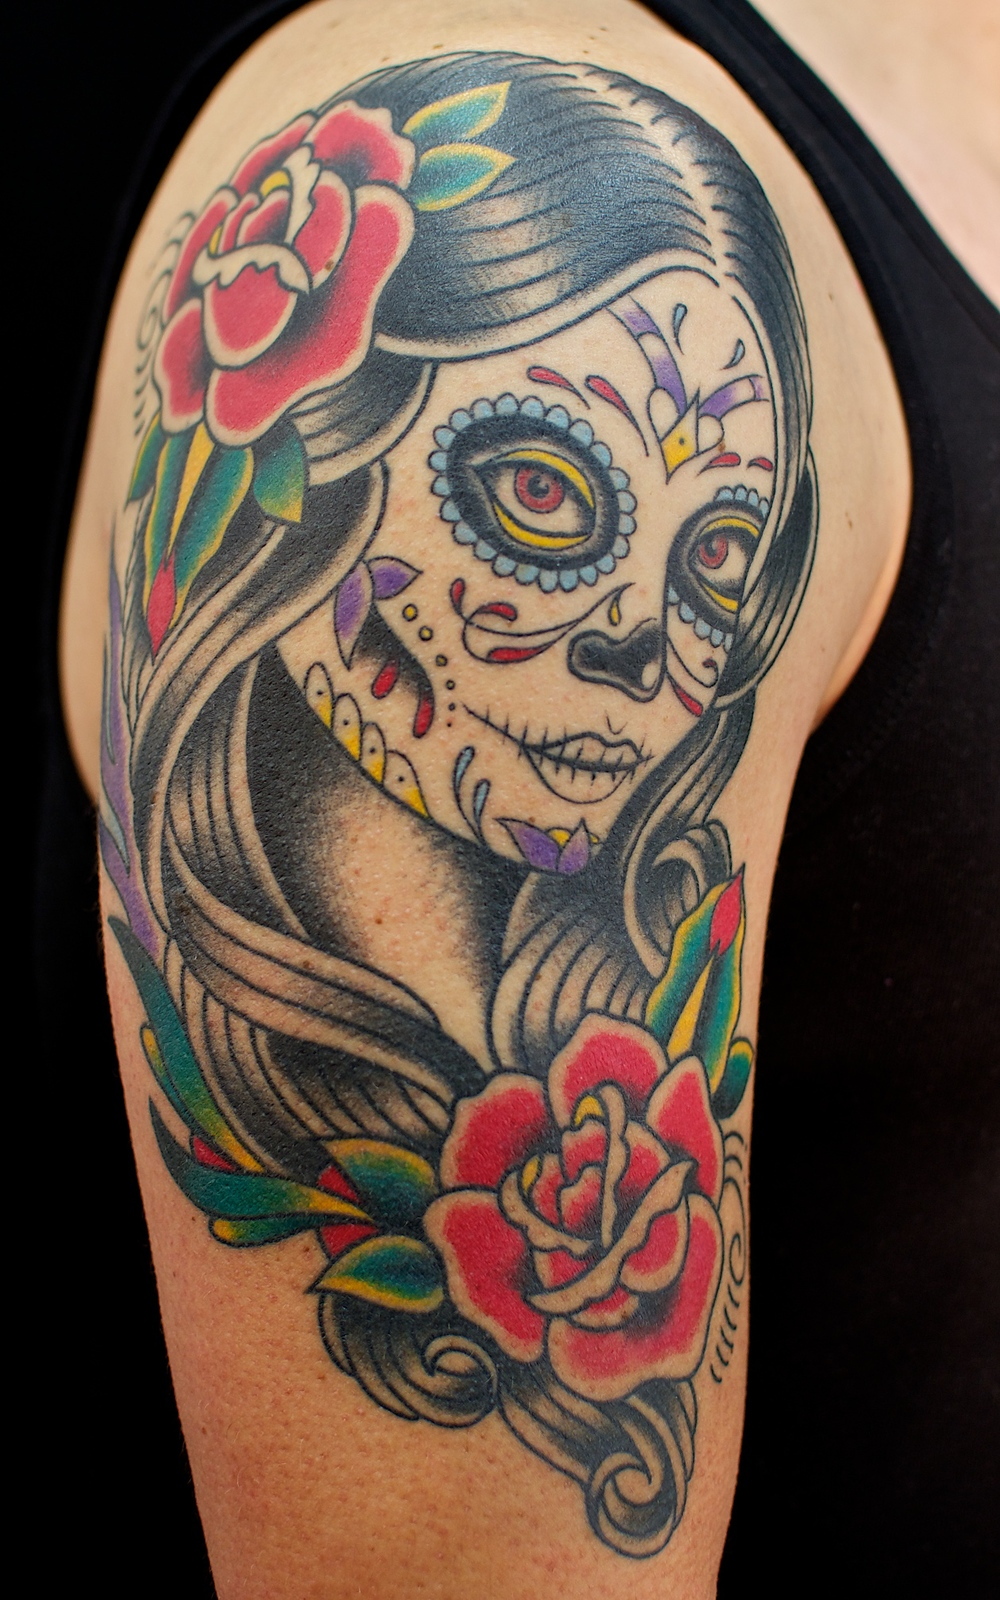 01022012 Tattoos 11 12.jpg